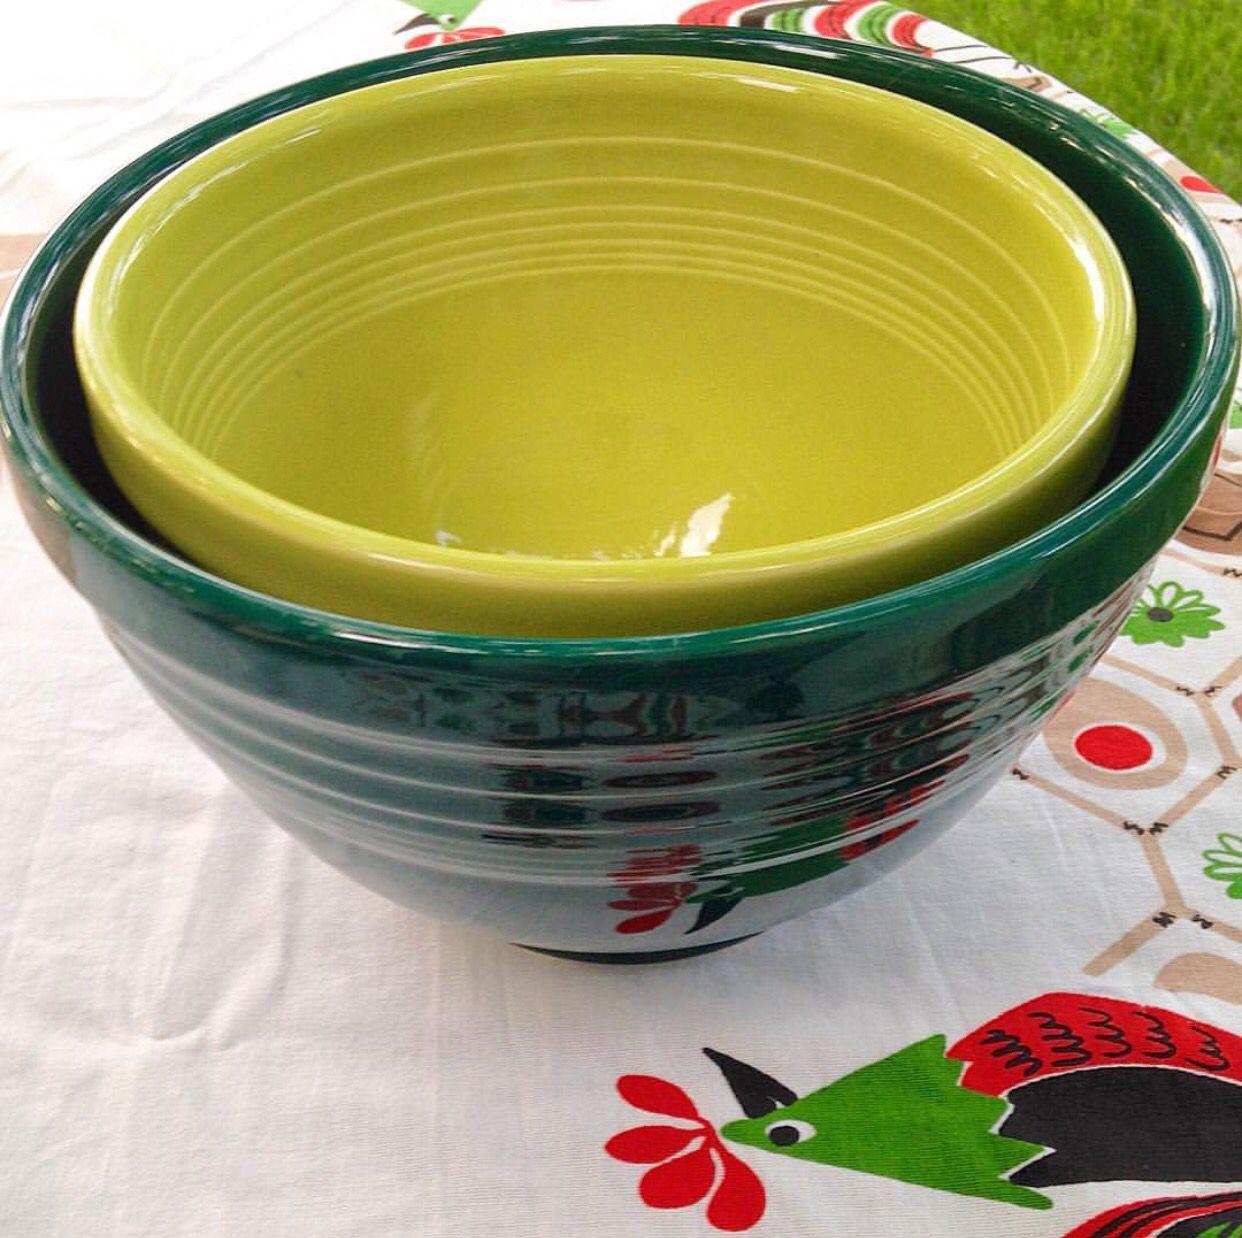 Fiesta lemongrass large prep bowl and evergreen small baking bowl ...